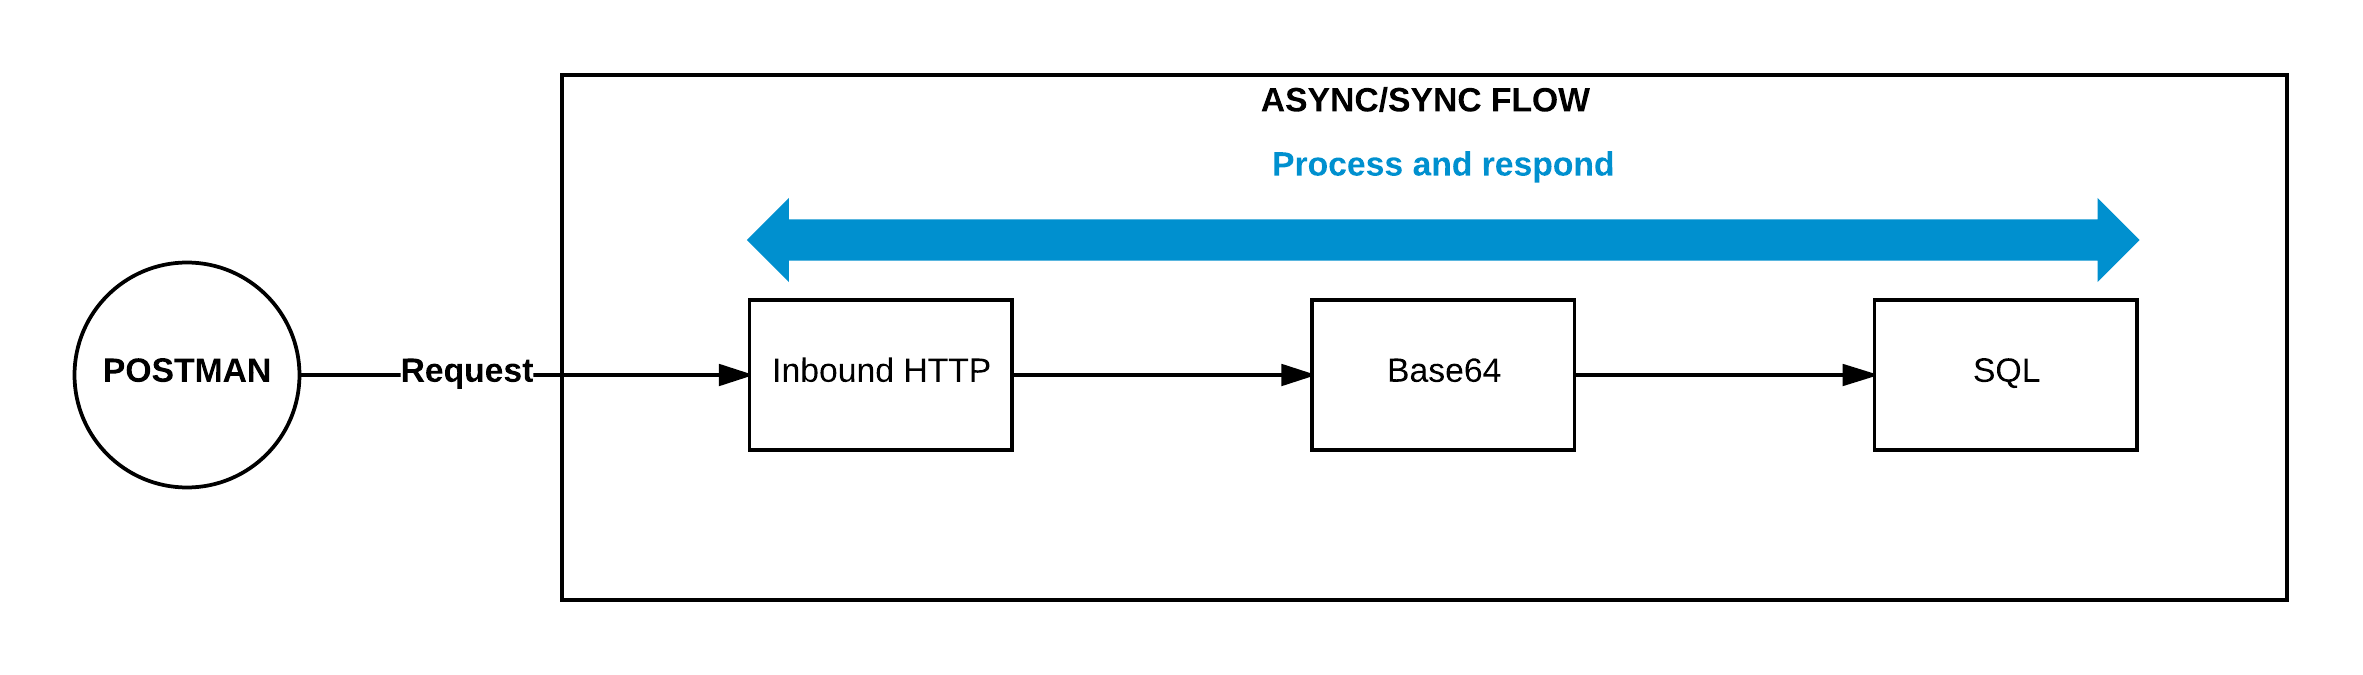 Inbound HTTP component explanation